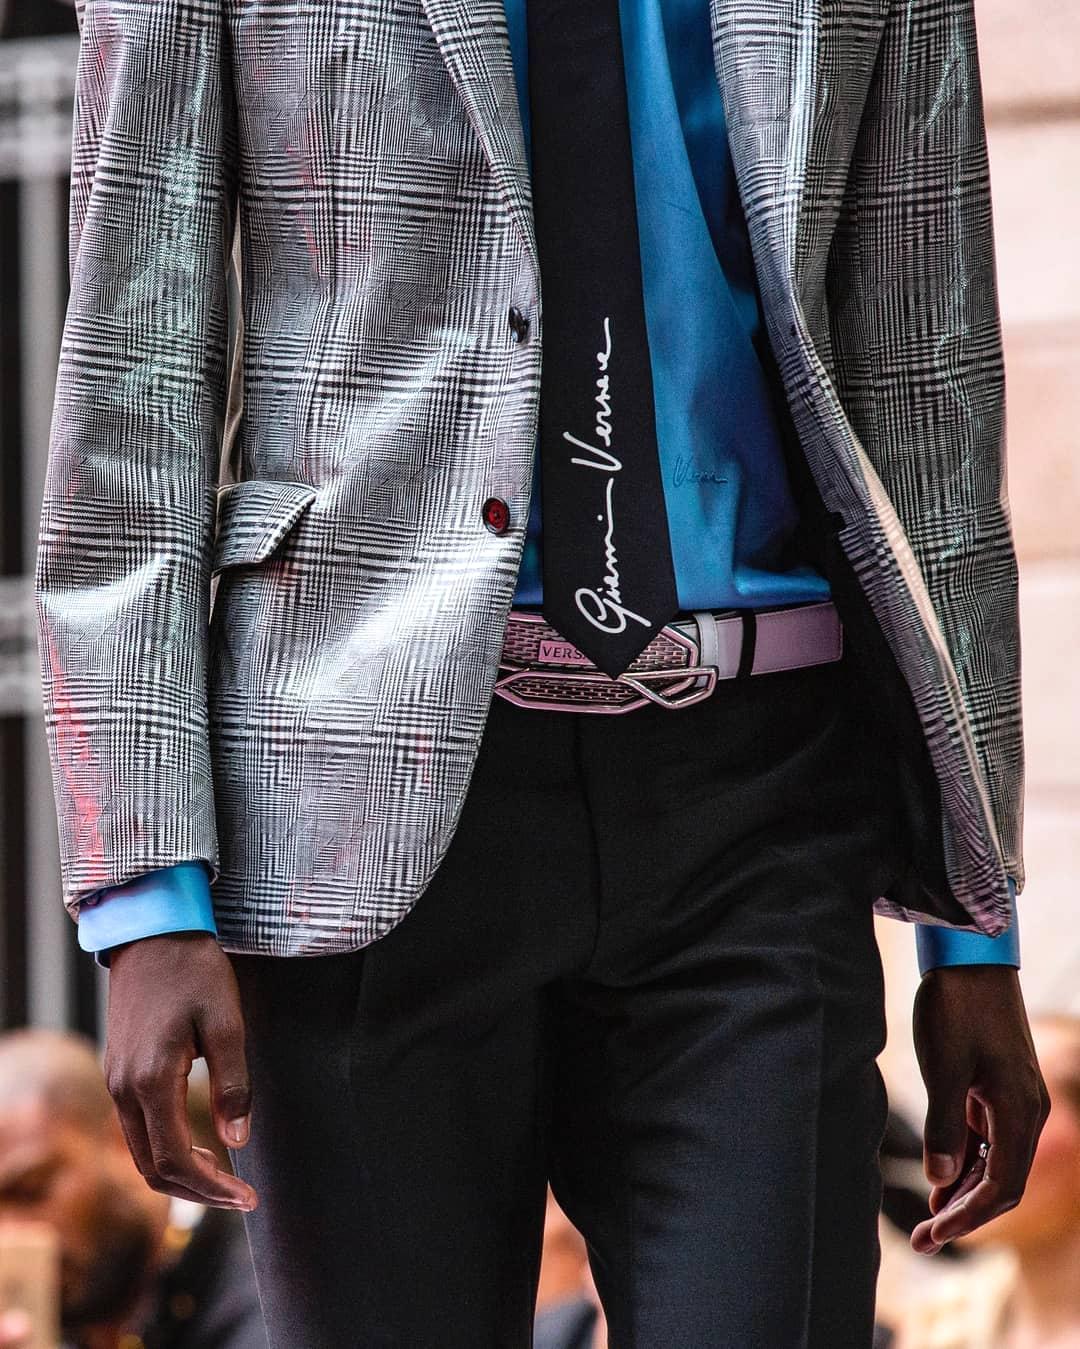 Донателла Версаче представила коллекцию Versace Spring/Summer 2020 Menswear